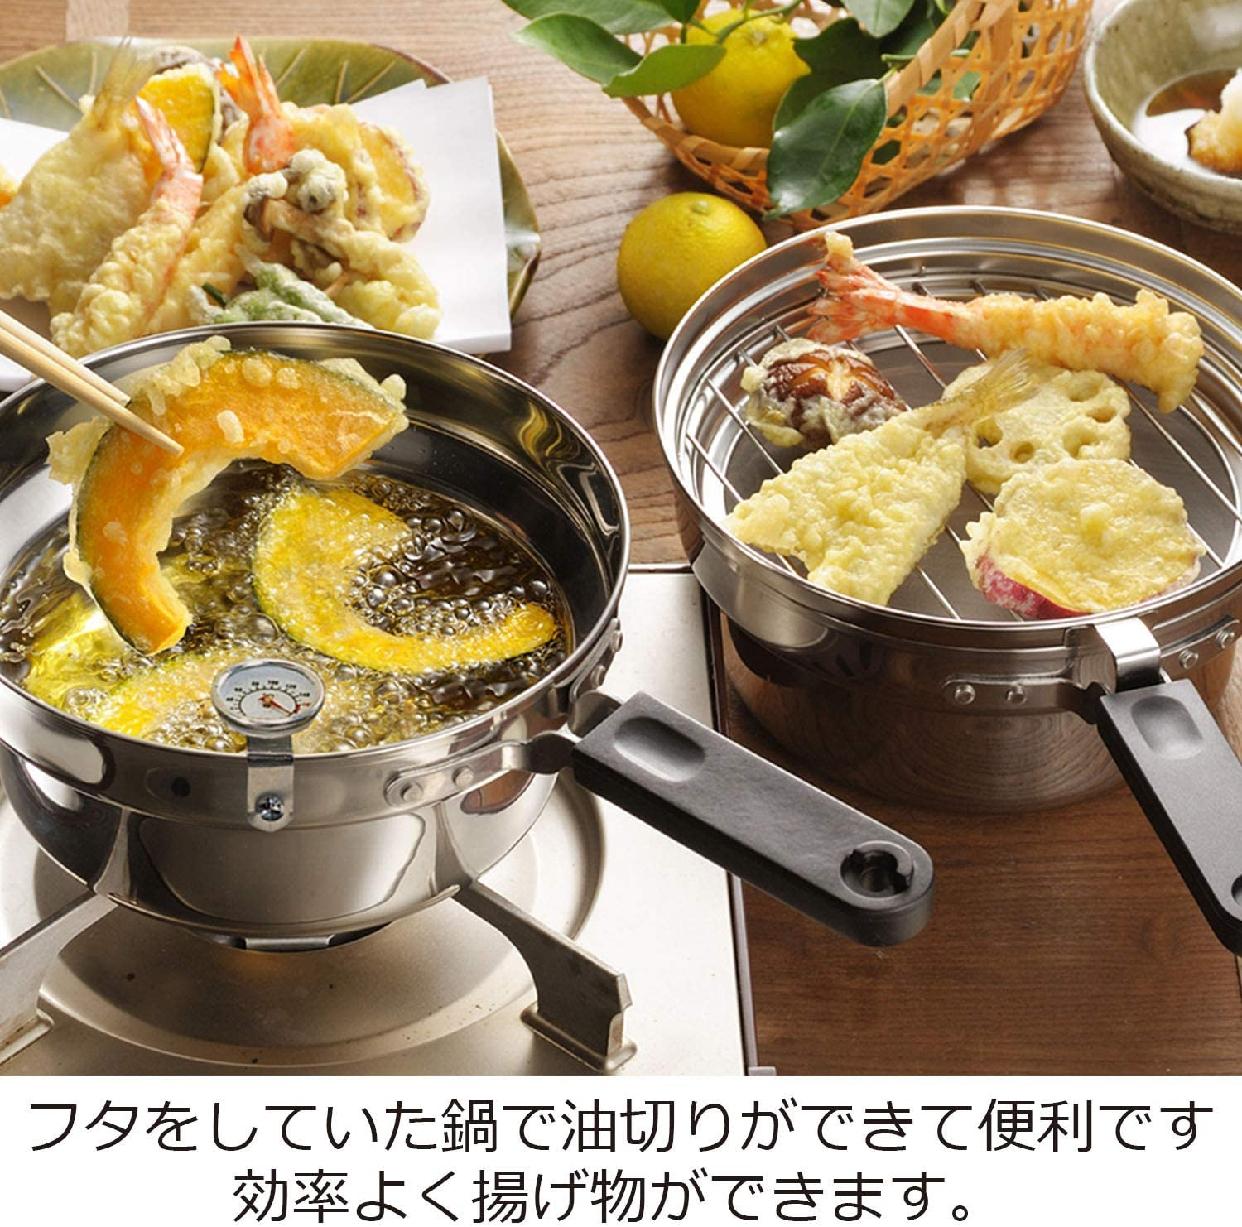 AUX(オークス)日本製 IH対応 片付け簡単 天ぷら鍋セット オイルポット 温度計付 シルバー T23の商品画像8